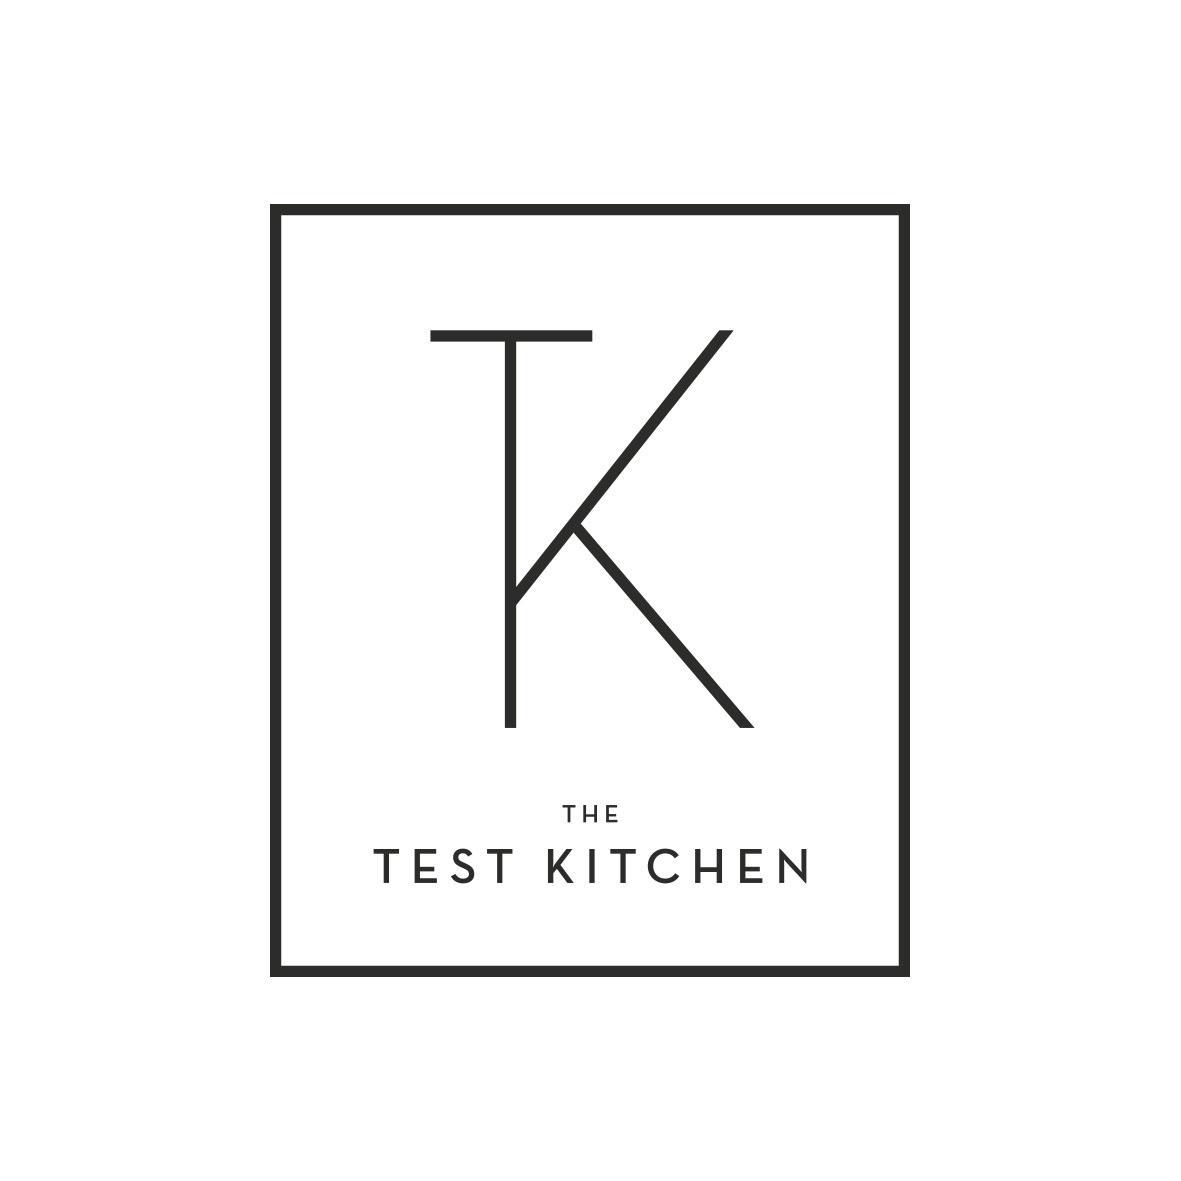 The Test Kitchen - London, London W1D 4SL - 020 7734 8487 | ShowMeLocal.com